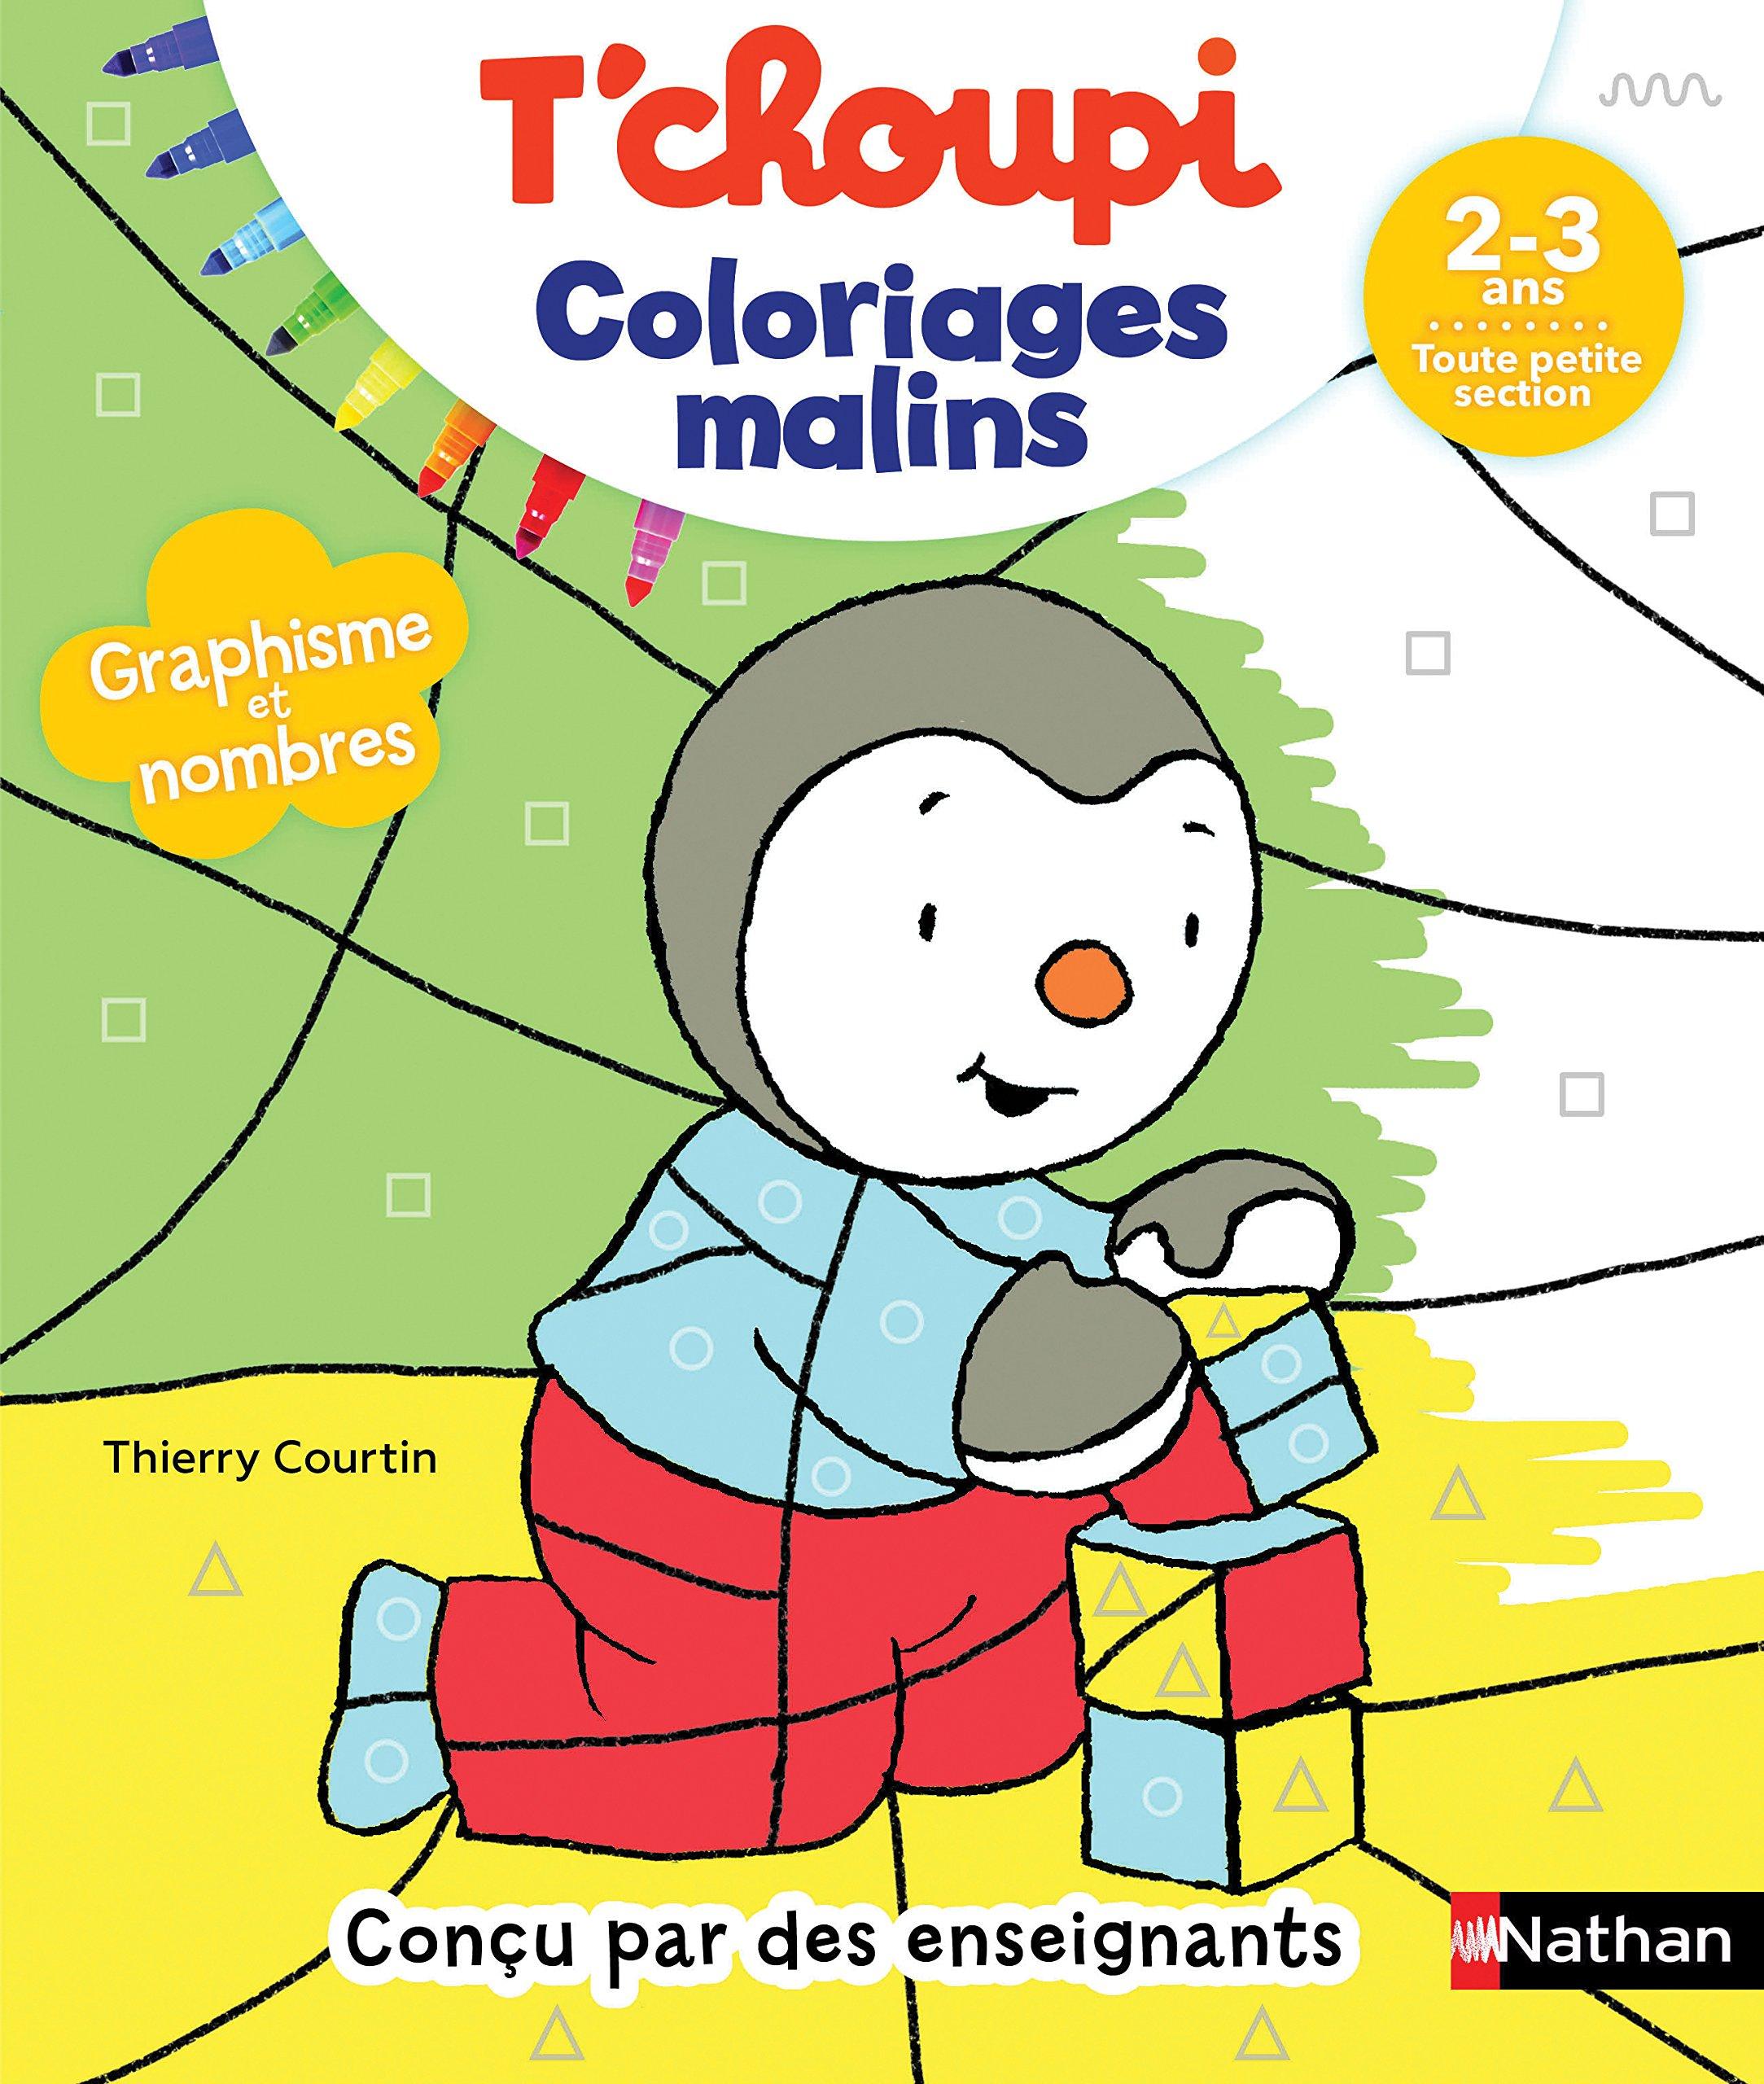 T'choupi Coloriages malins 322 32 ans Toute petite section ...